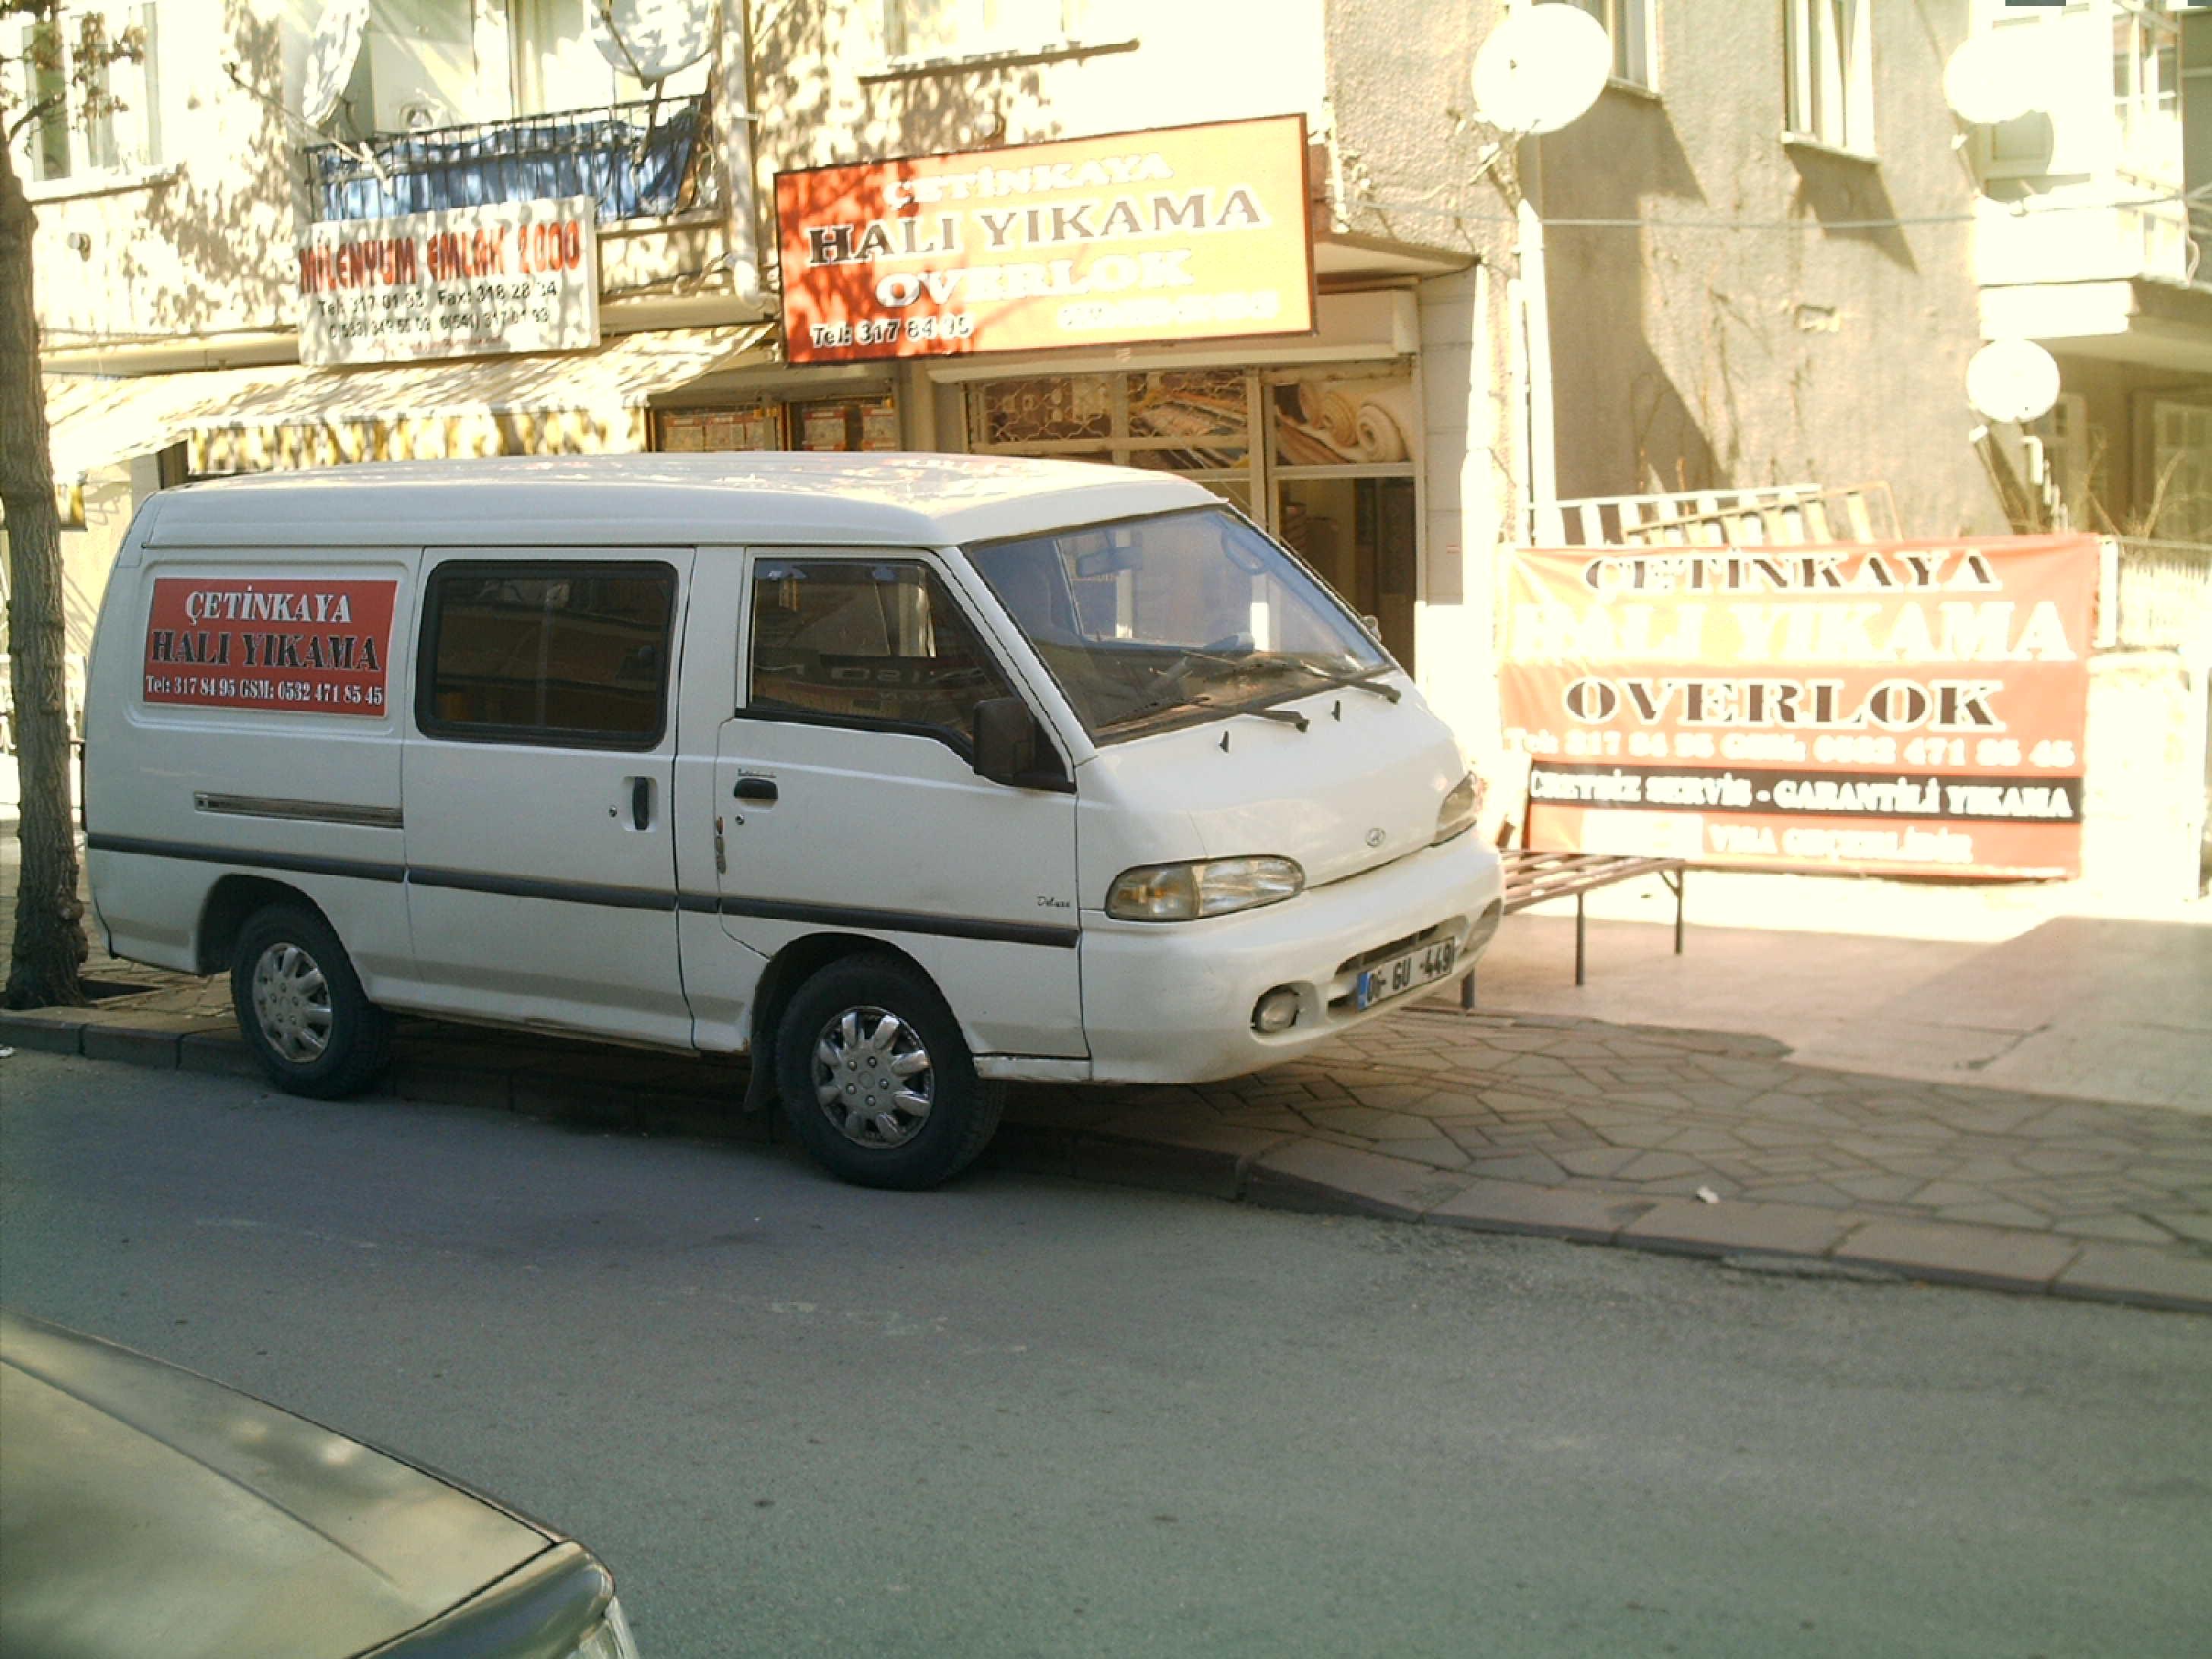 emek_hali_yikama_servis-1-1